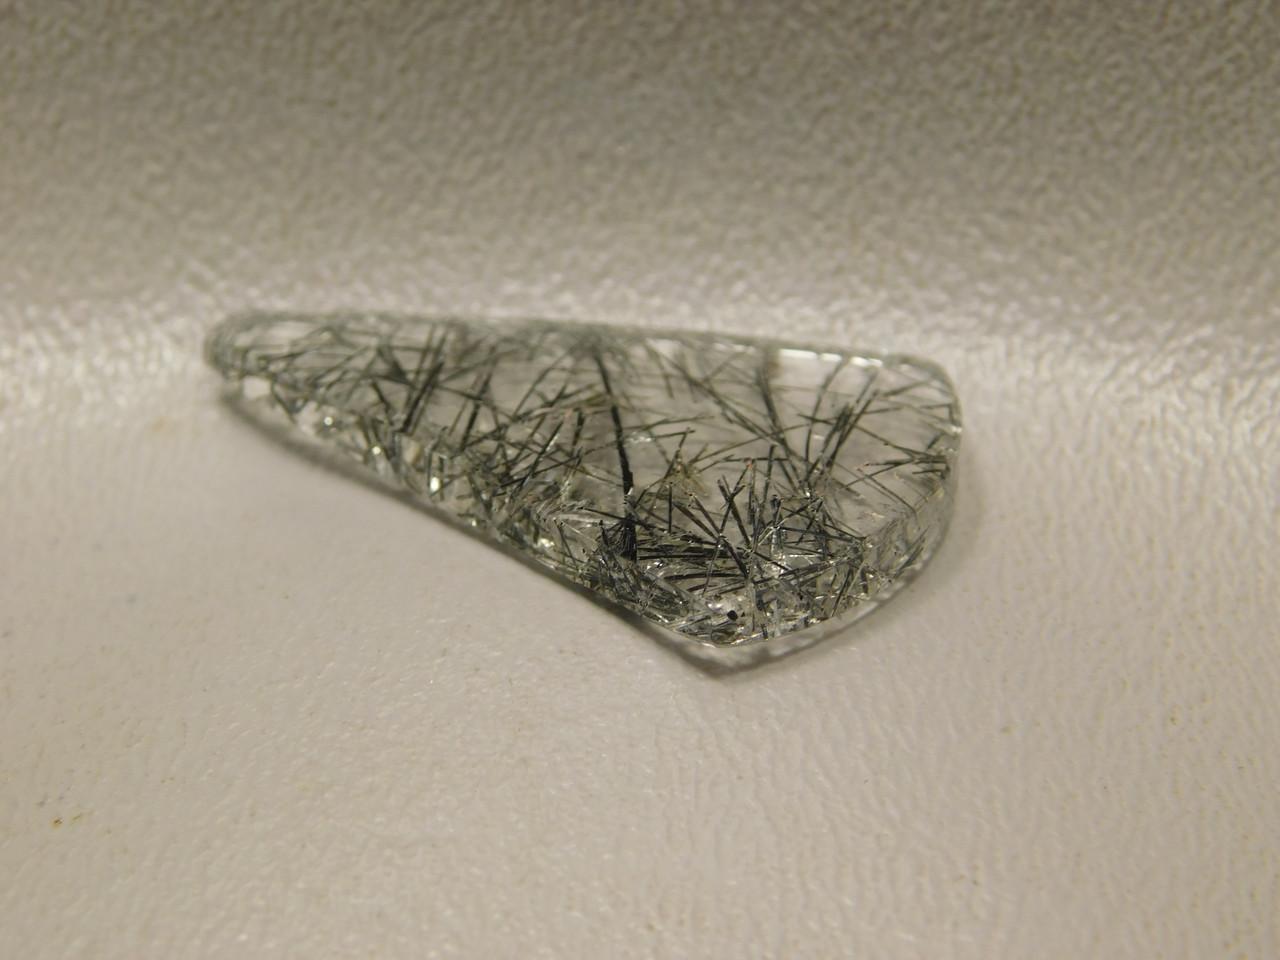 Tourmalined Clear Quartz Teardrop Shaped Cabochon #12